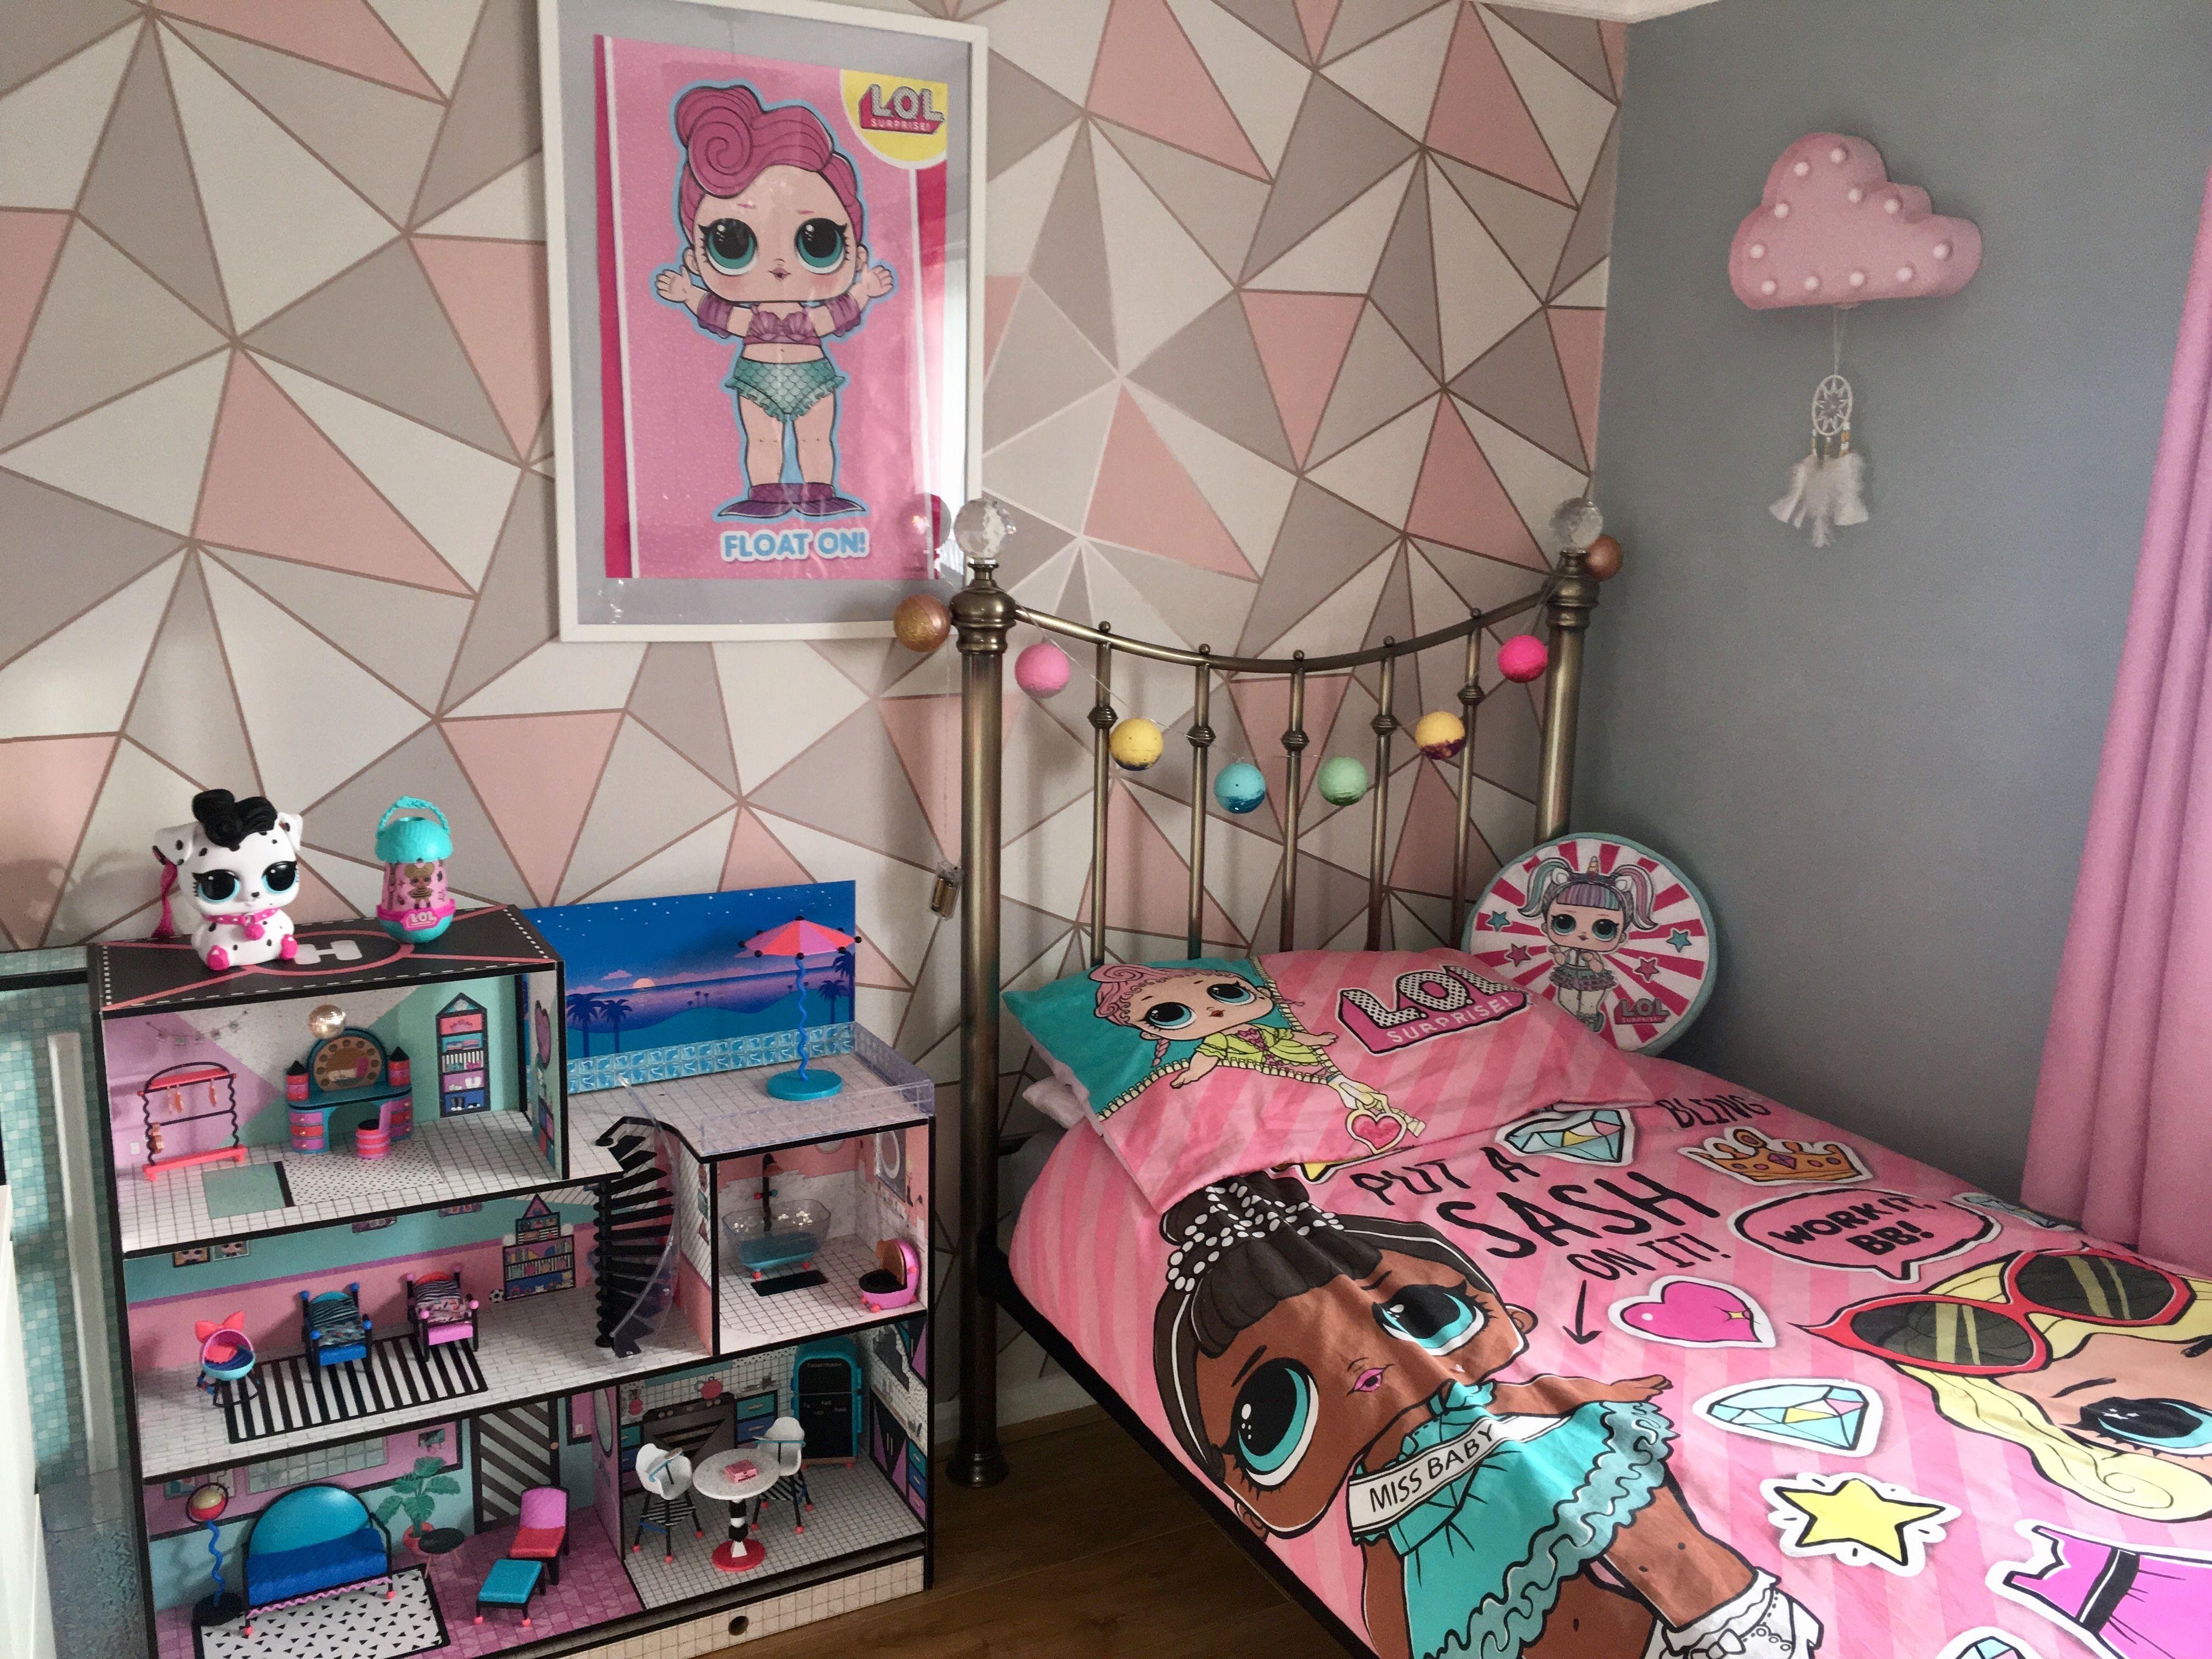 My Little Girls Lol Inspired Bedroom Girlsbedroom Lolsurprise Lol Lolsurprisedolls Loldolls Toddler Girl Room Cool Girl Bedrooms Kids Bedroom Designs